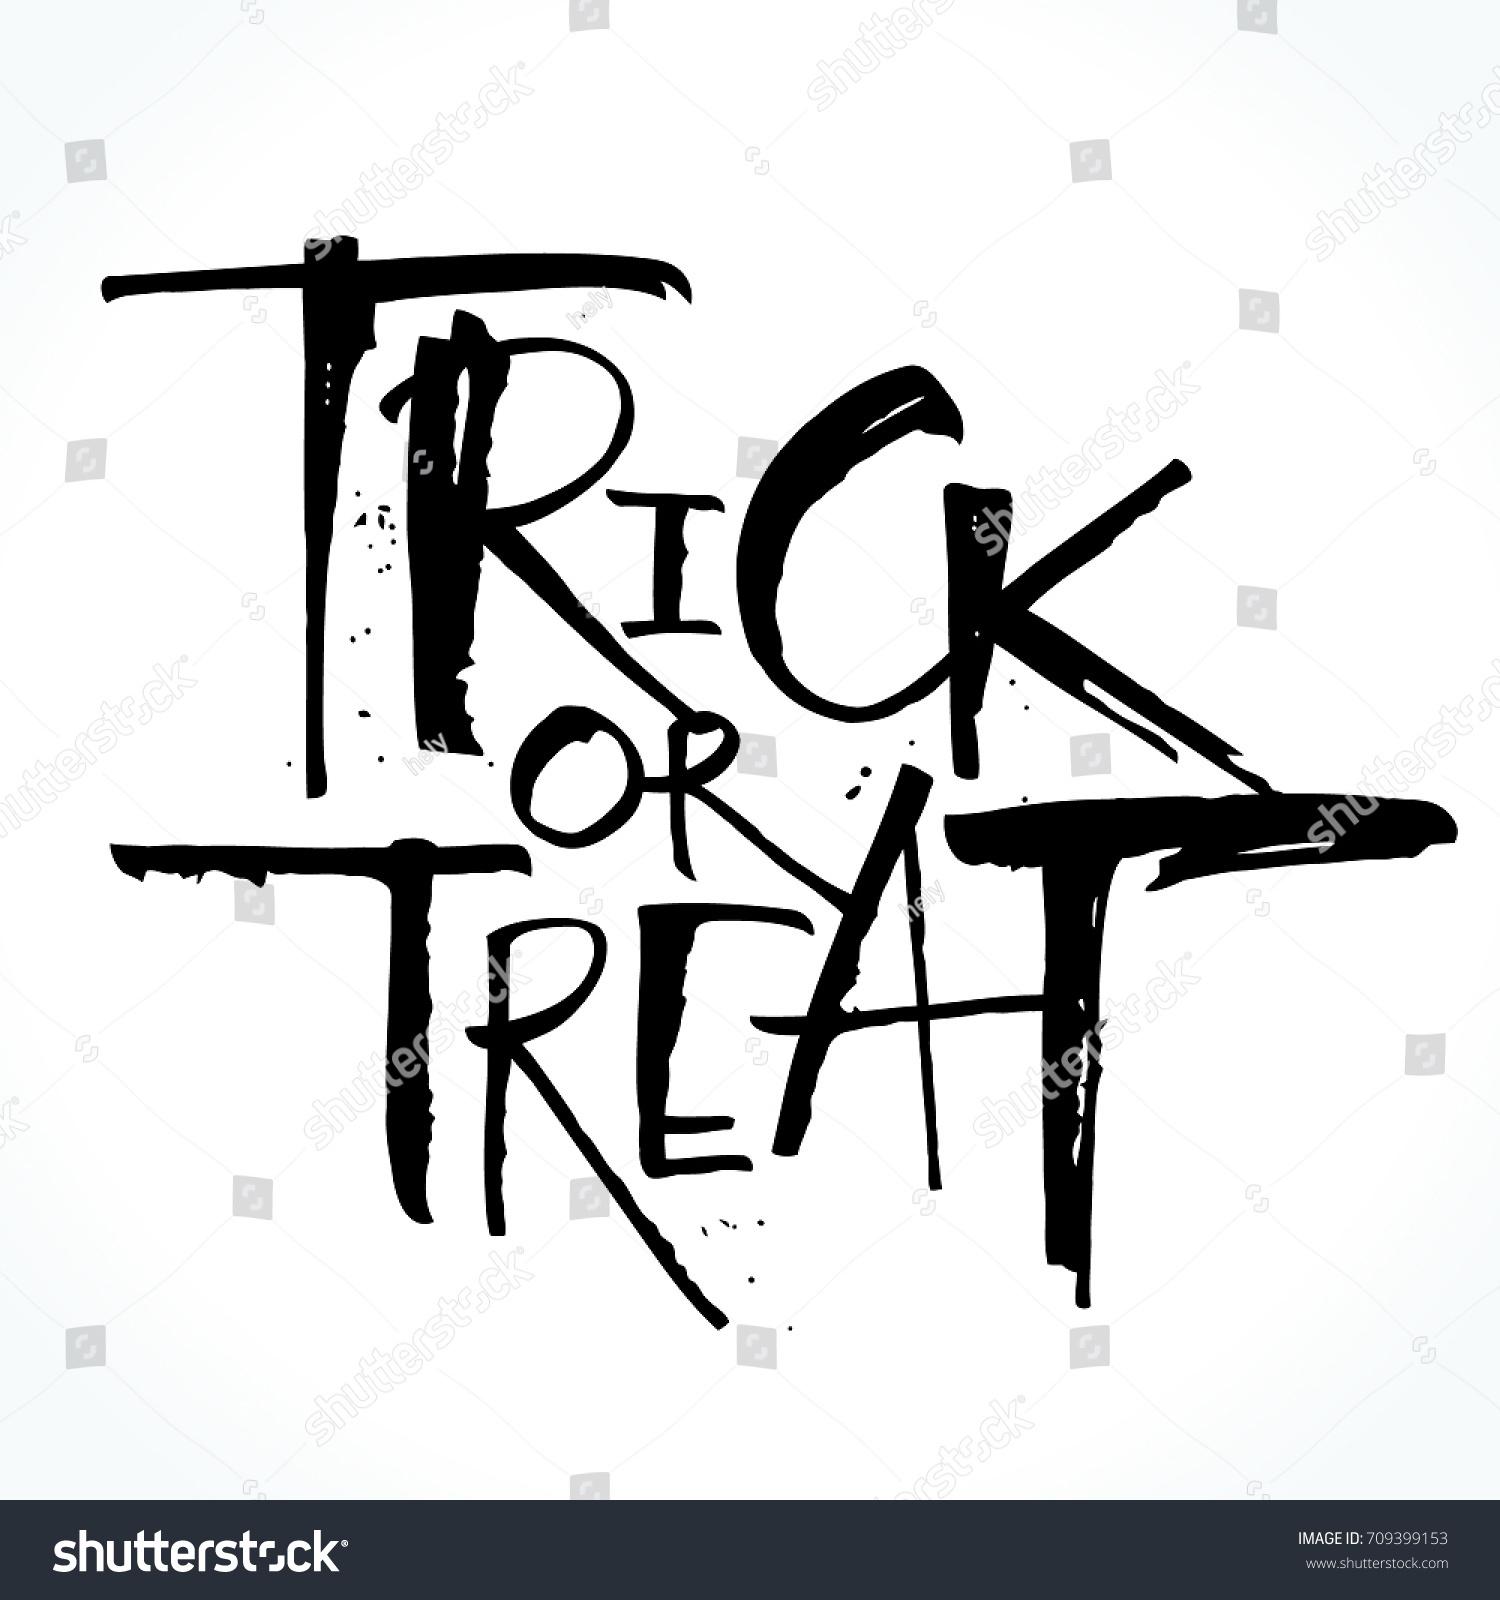 Trick Treat Lettering Halloween Handwritten Modern Stock Vector